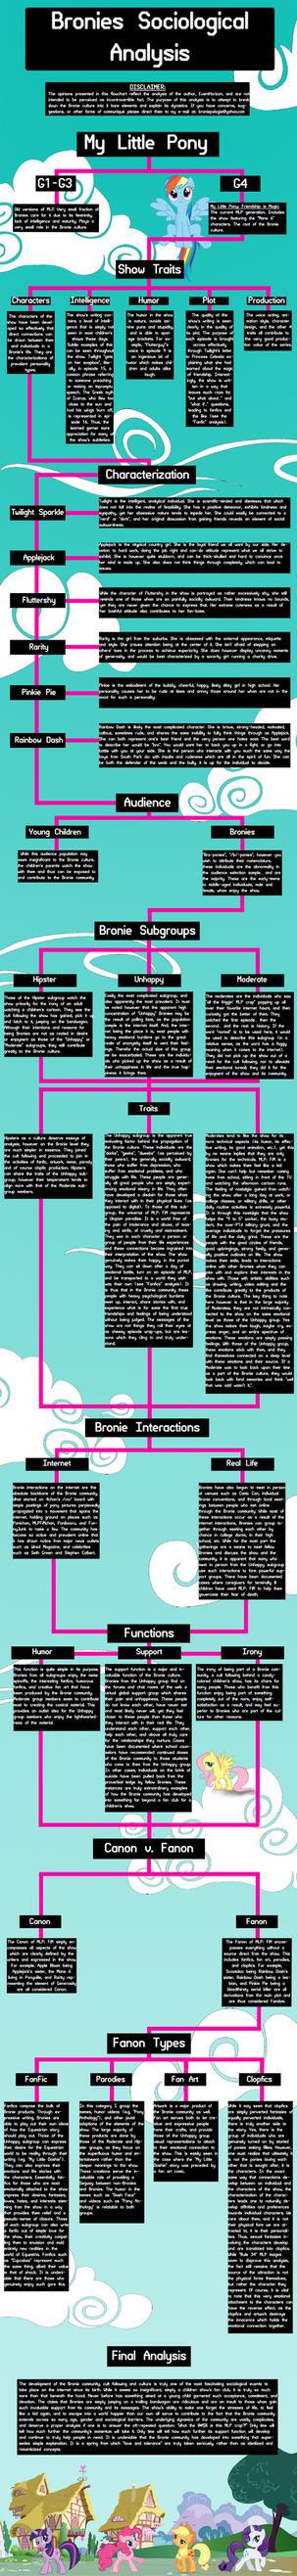 Bronie Sociological Analysis Flowchart by BroniePologist